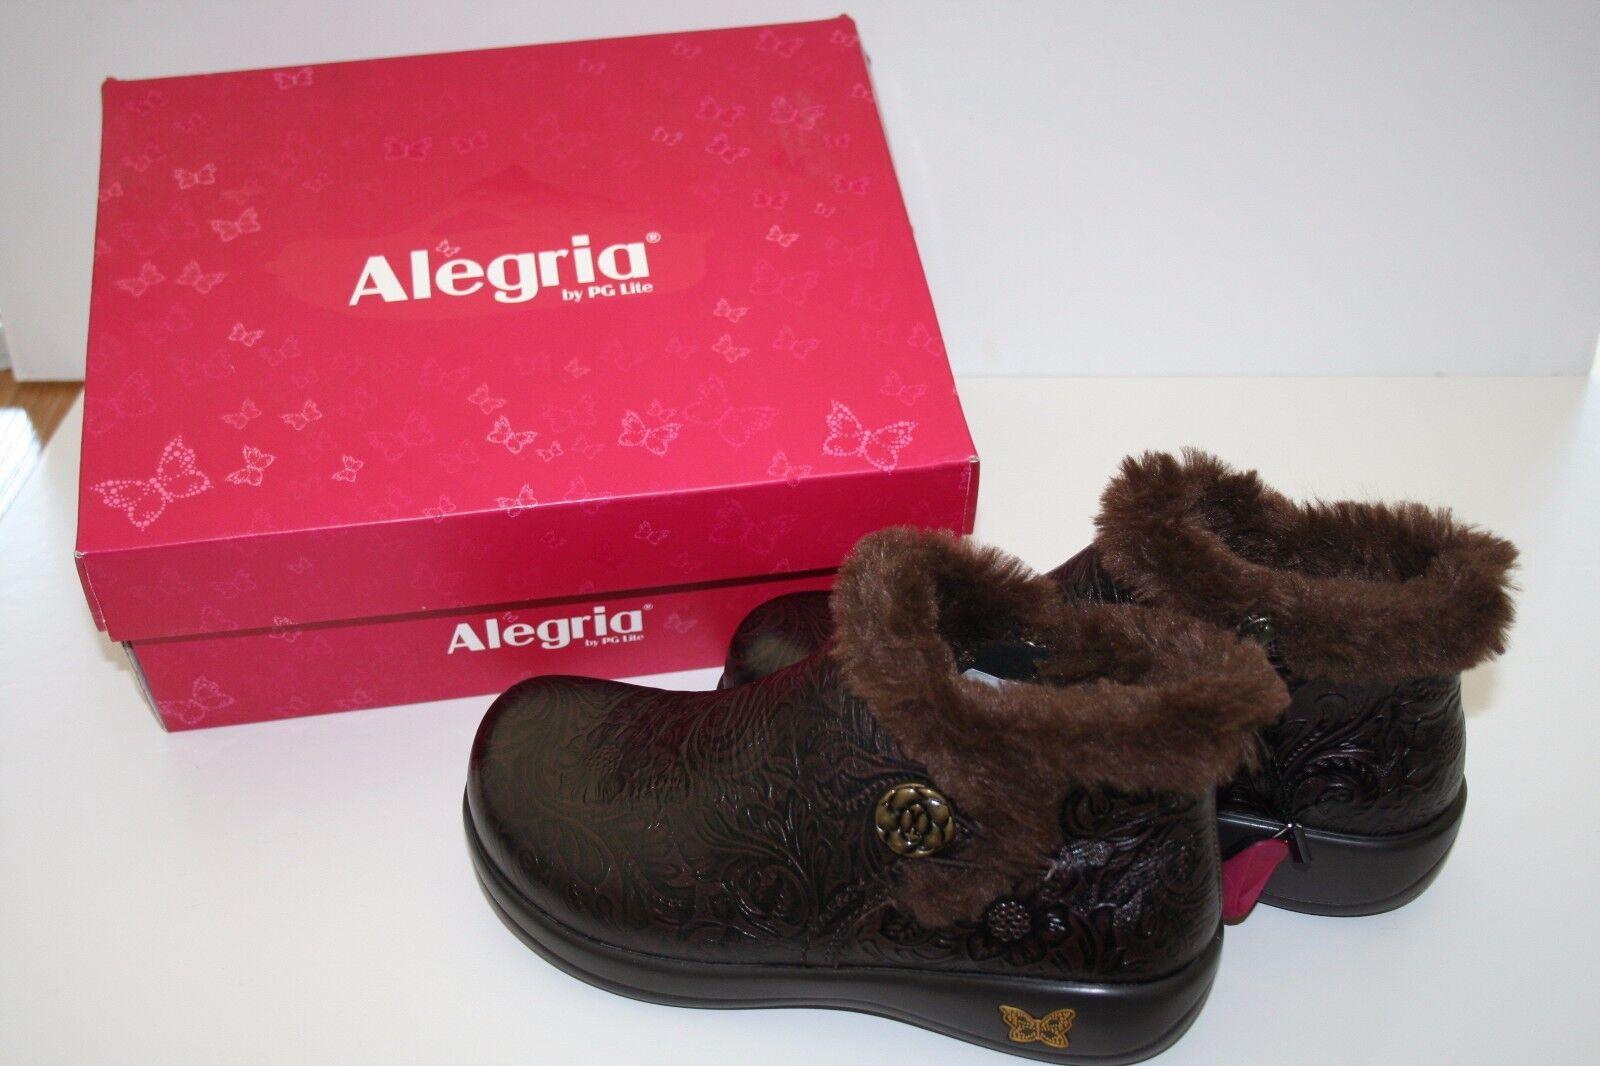 Alegria Damenschuhe Meri Synthetic Fur Rain Boot Molasses Tooled 36W Größe 36W Tooled  US 51/2-6 4b36fd